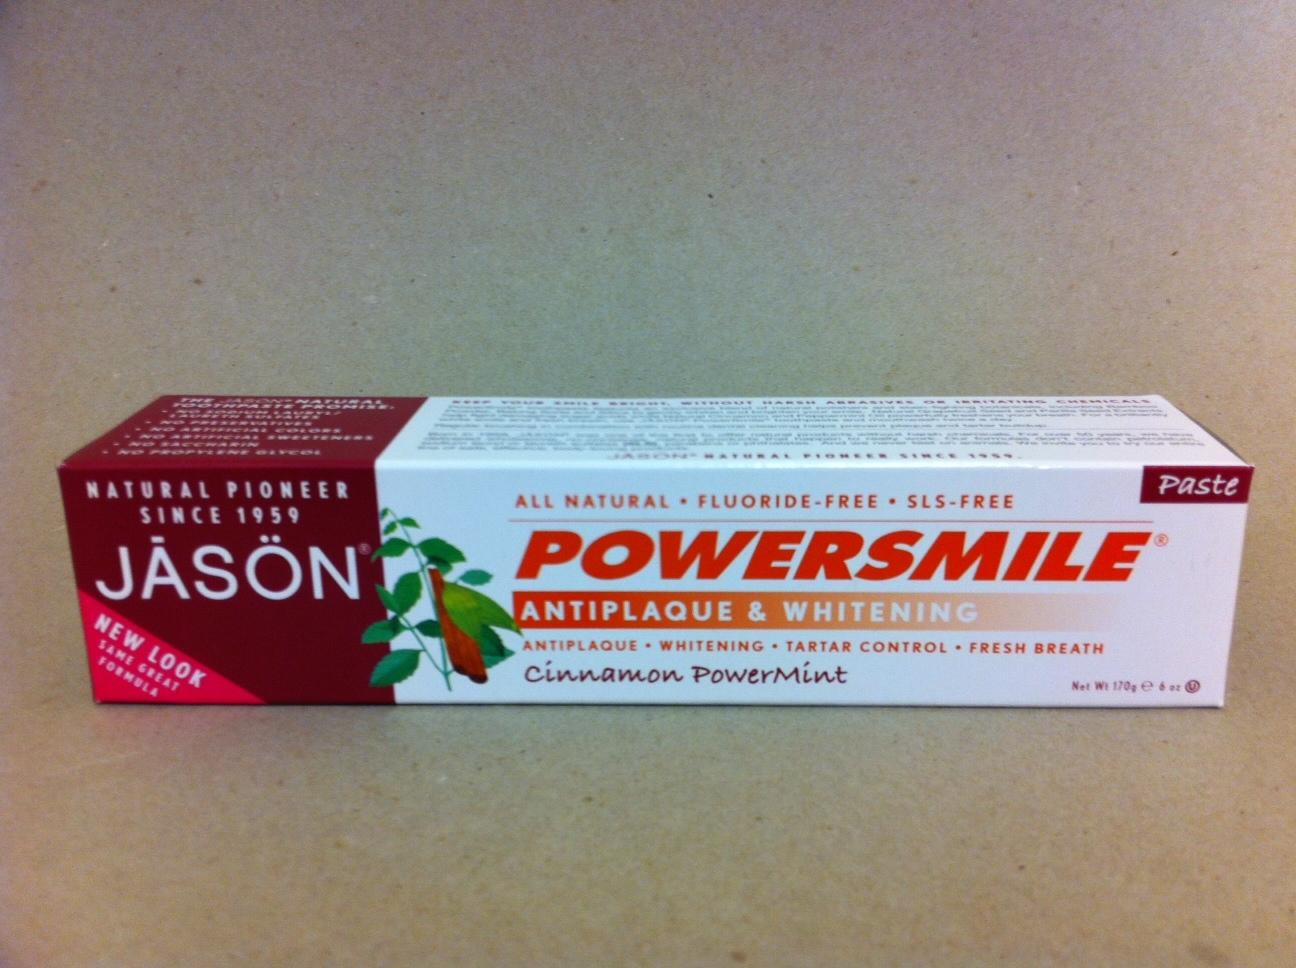 Jason Cinnamon PowerMint Toothpaste 1495